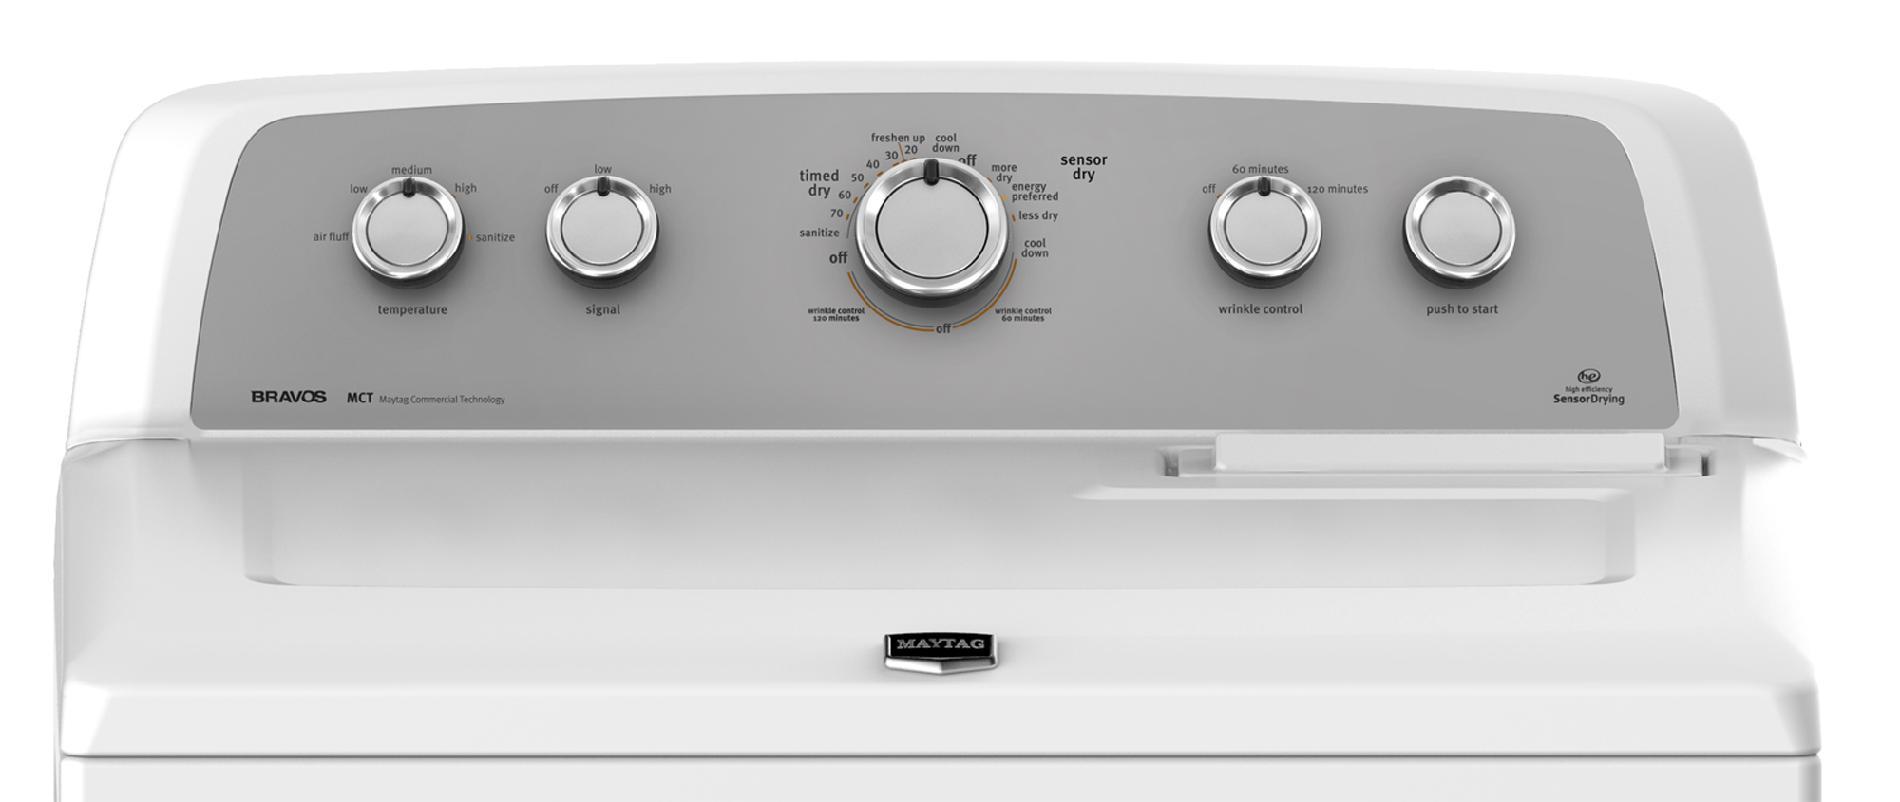 Maytag 7.0 cu. ft. Bravos X™ Electric Dryer - White